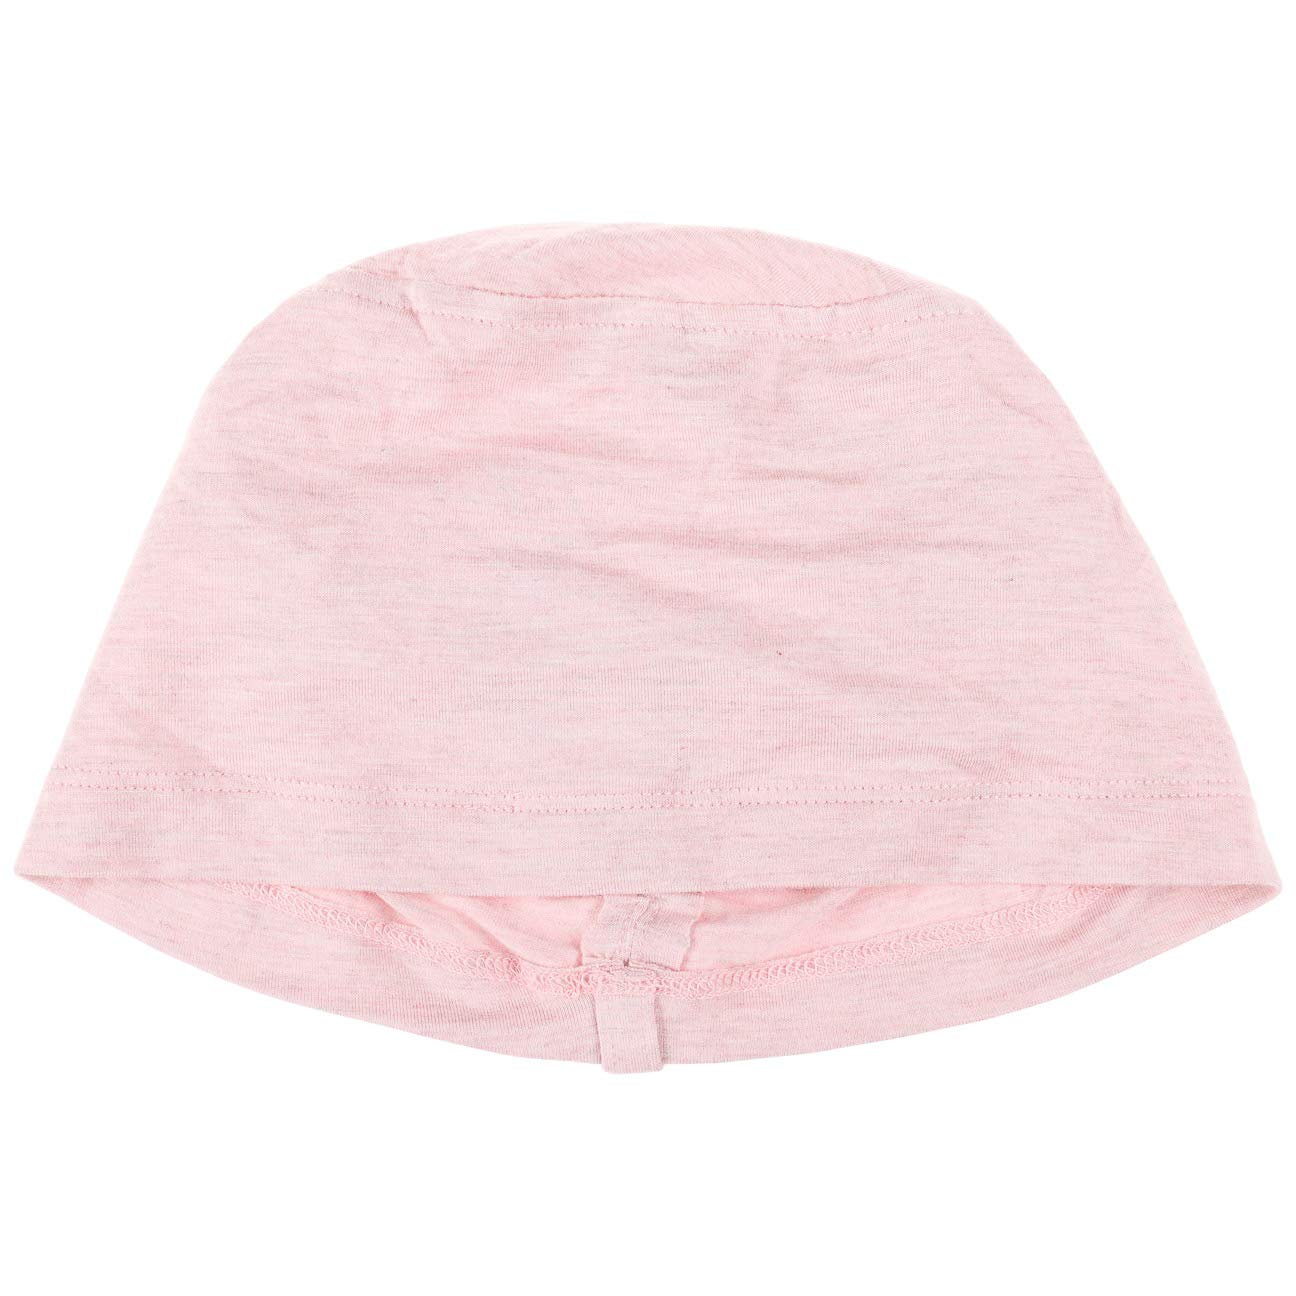 Christine Headwear Chandra Night CapHeadwear Cloth hat Women/´s Beanie